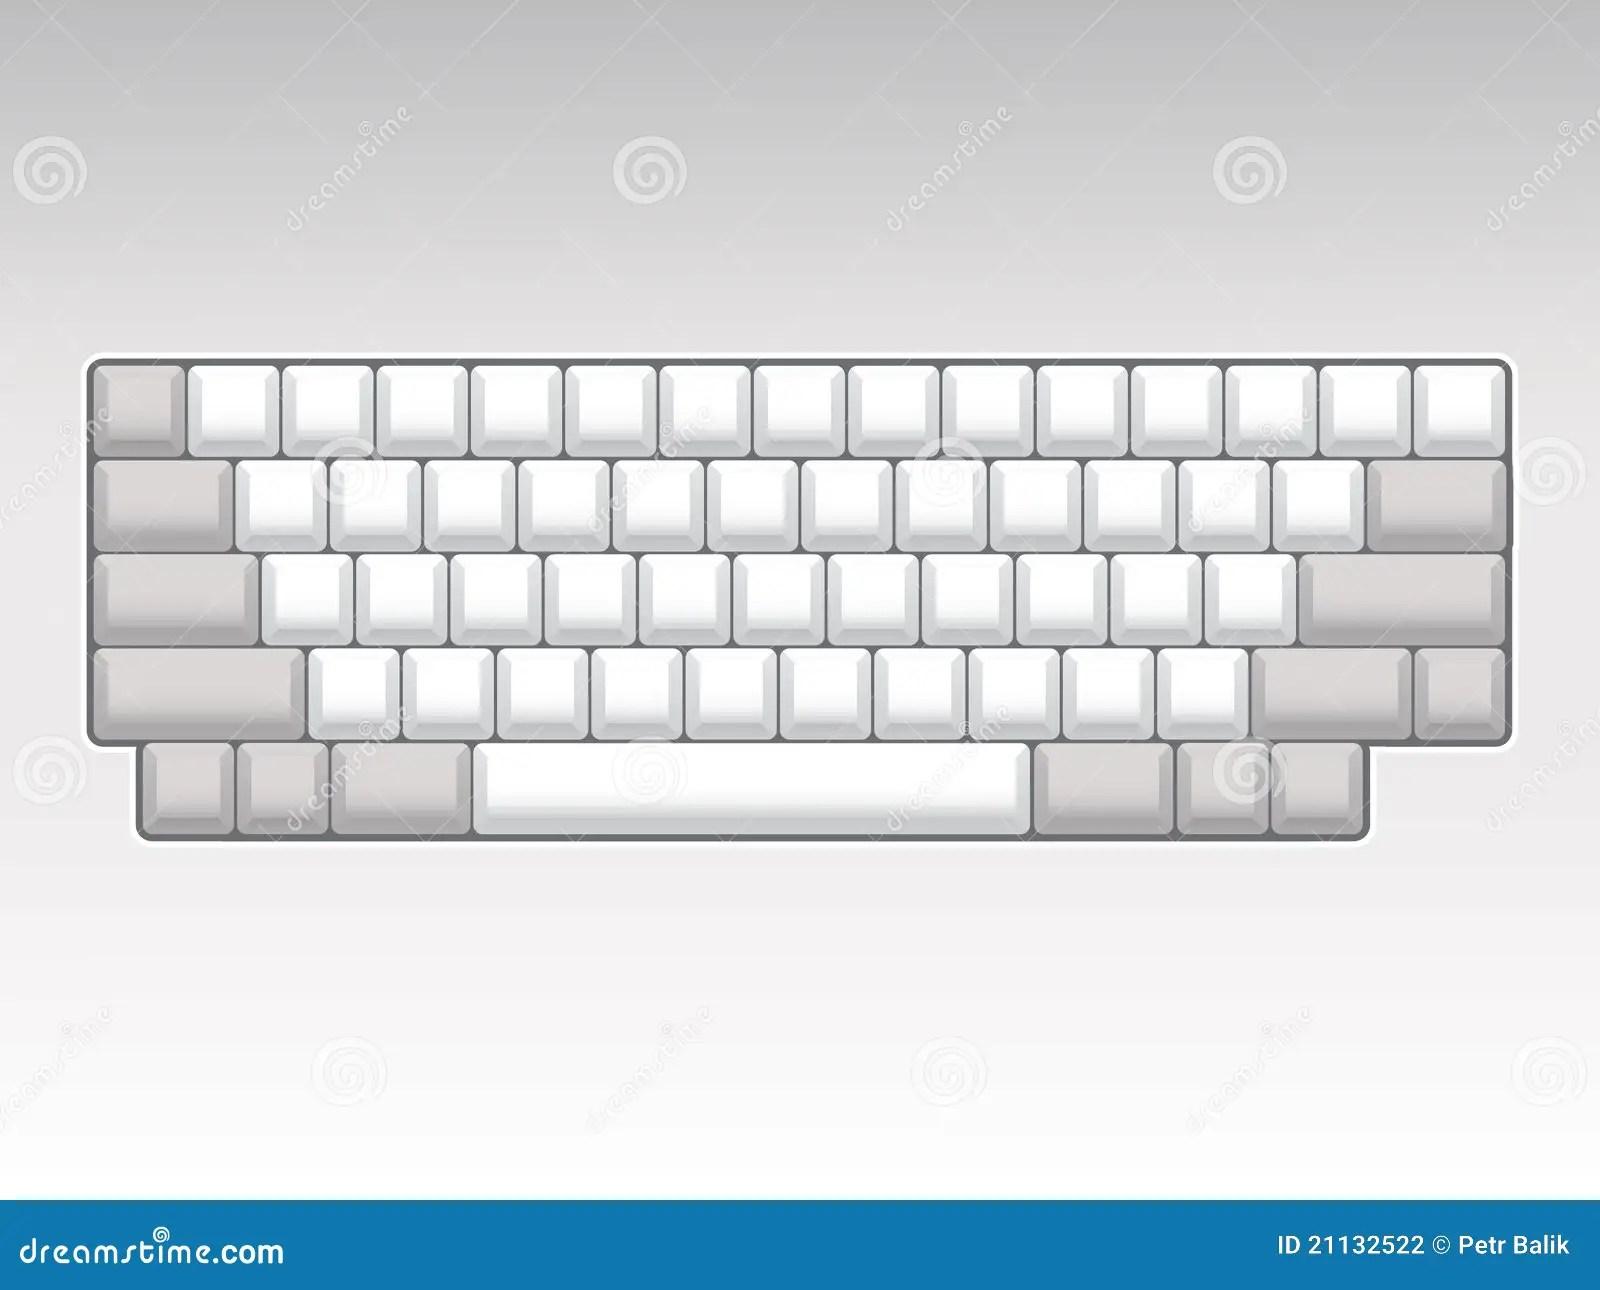 Blank Keyboard Layout Stock Illustration Illustration Of